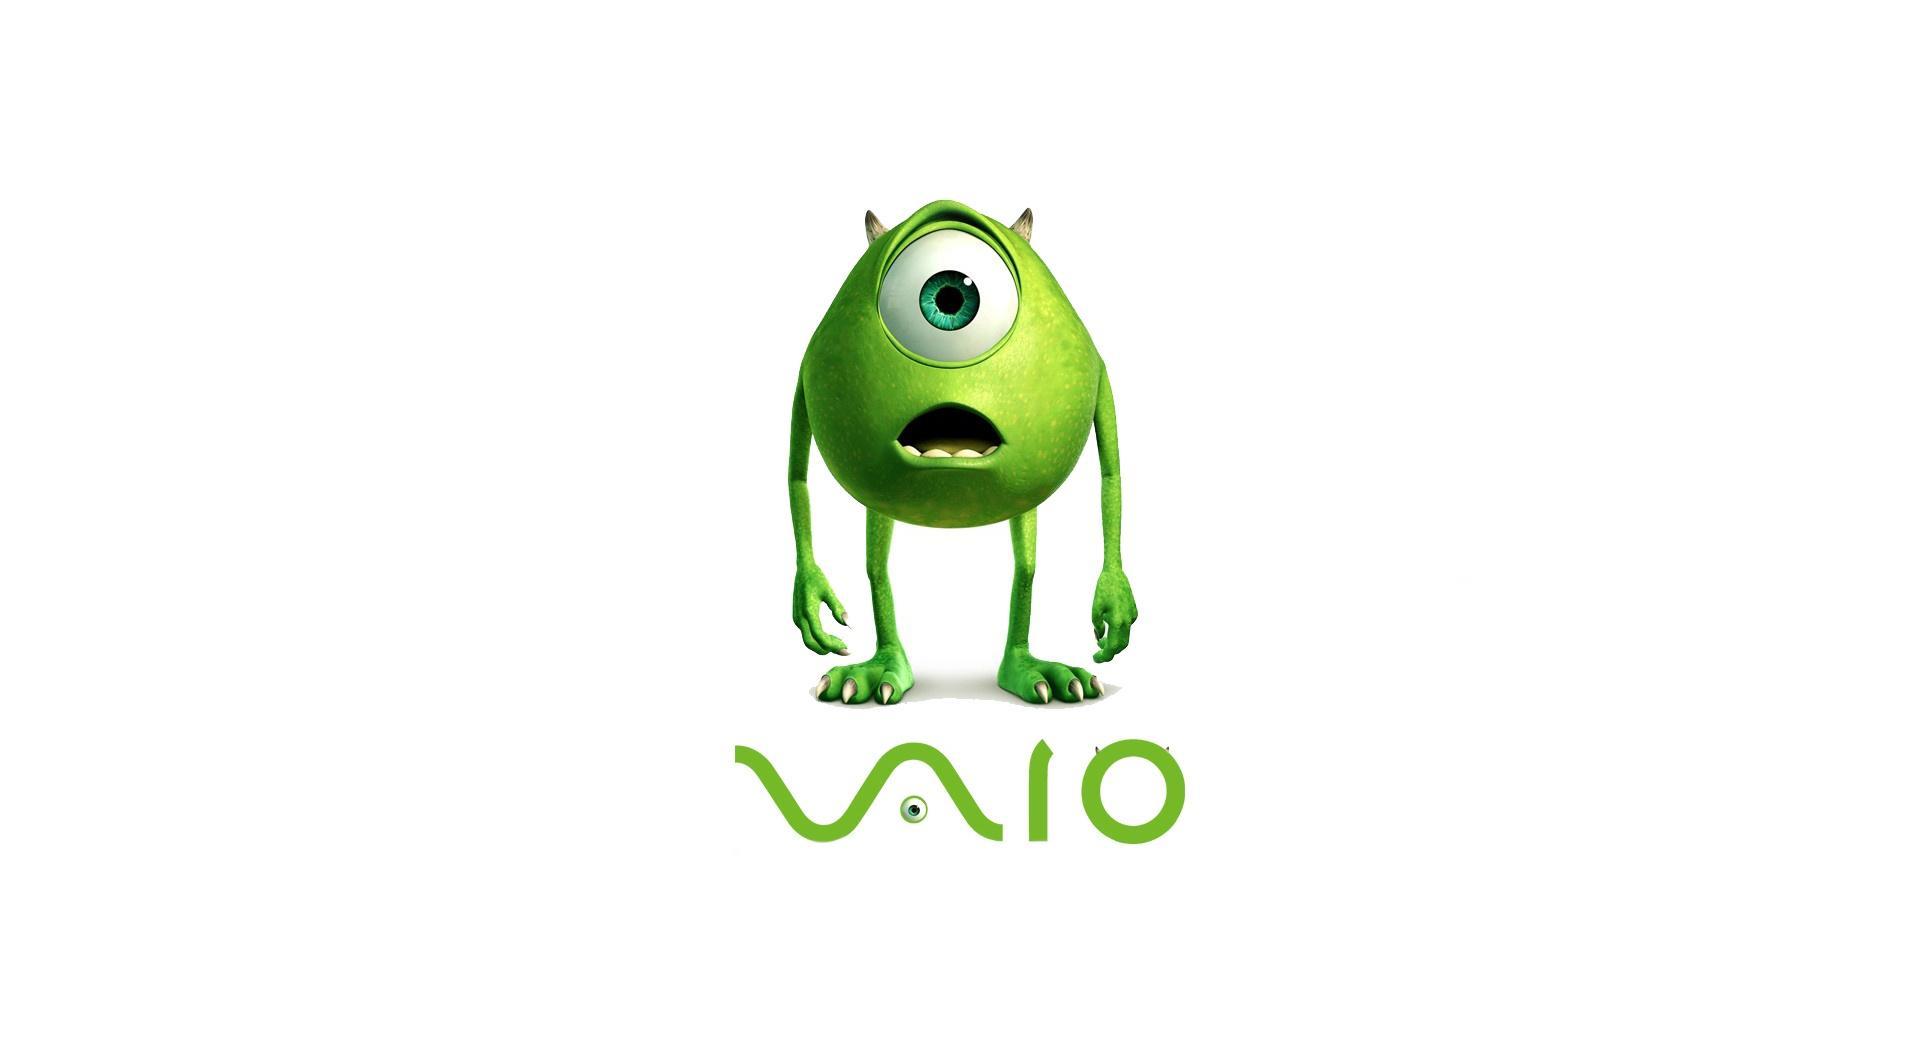 Vaio Green Eye wallpapers HD quality